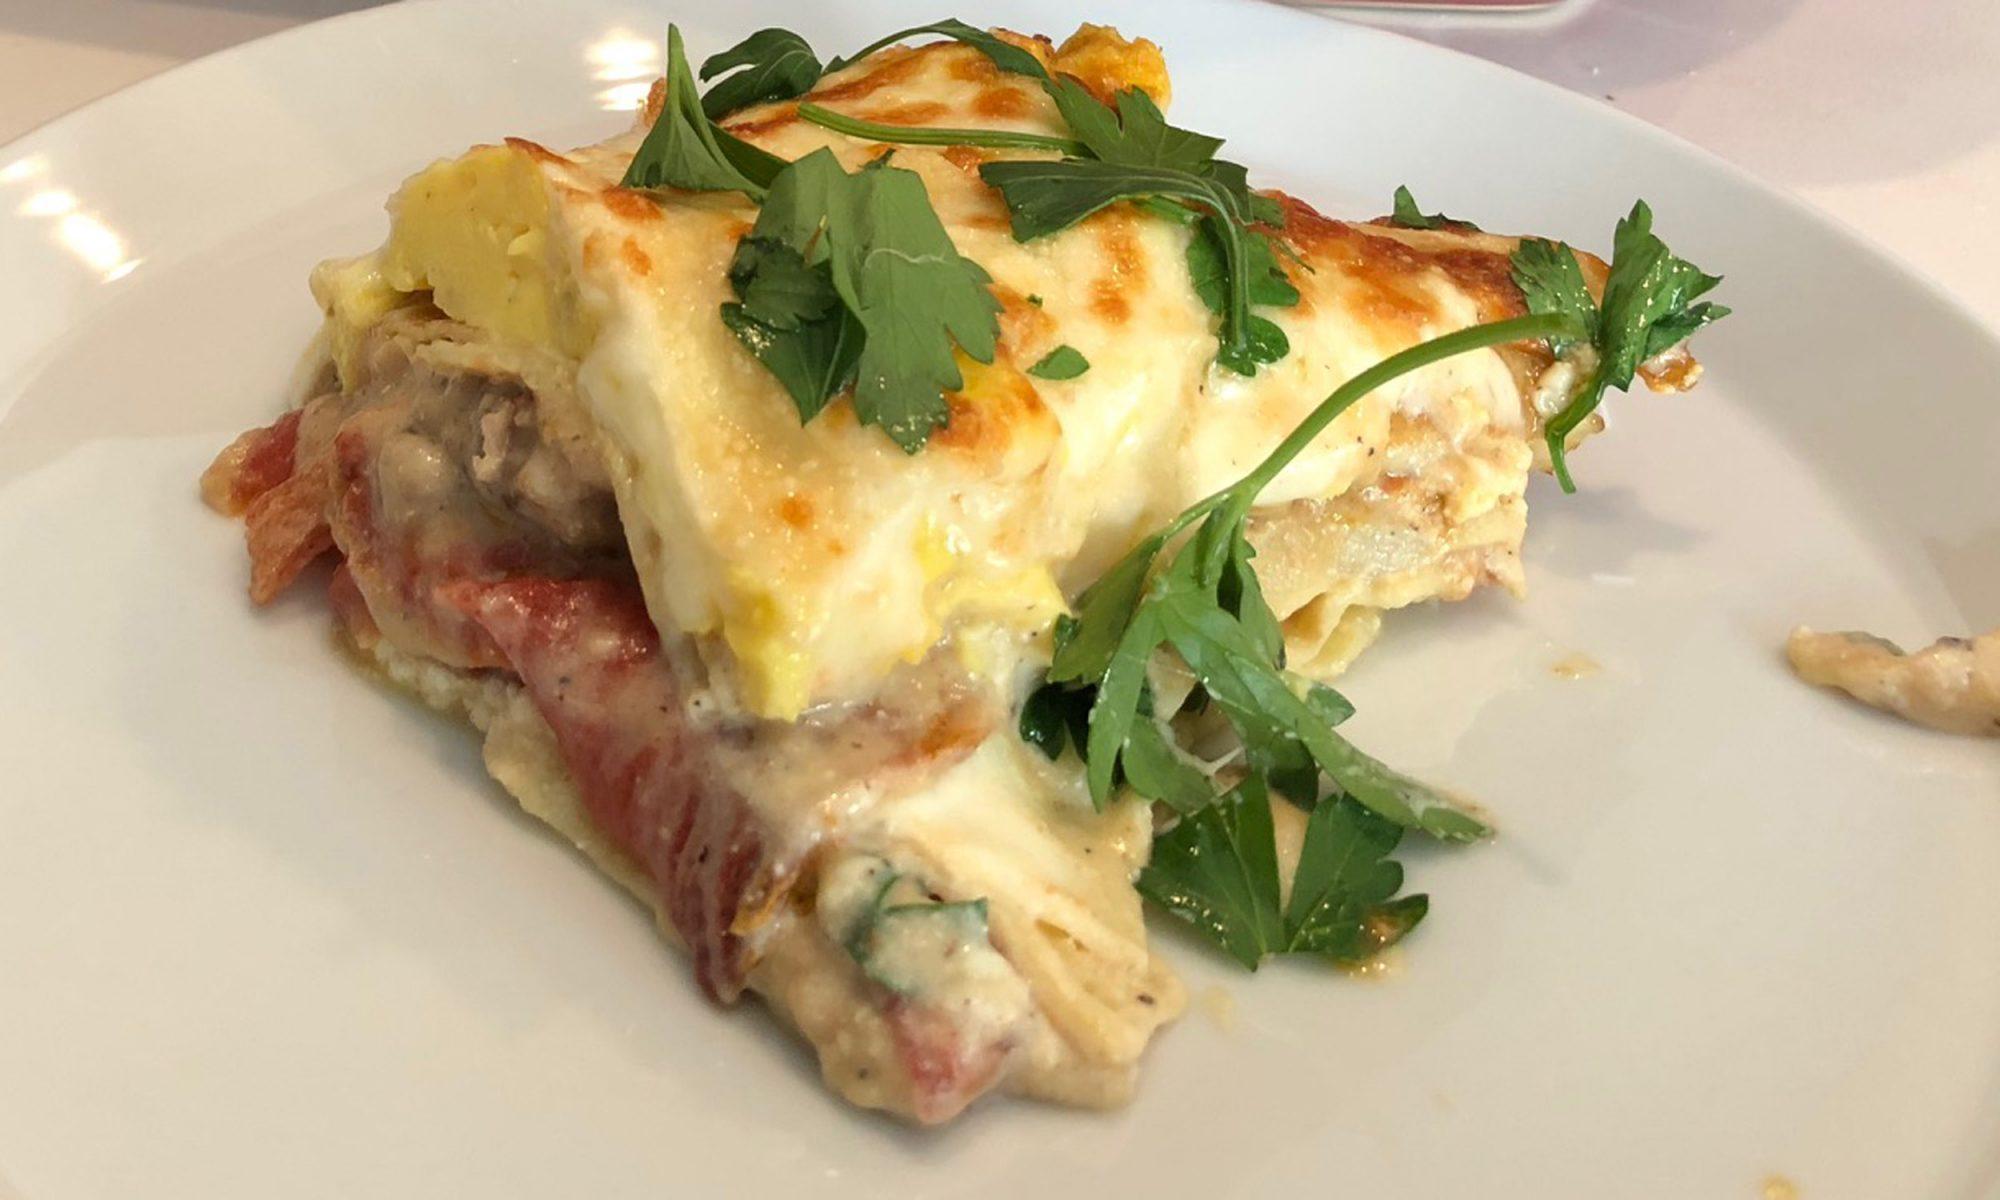 Breakfast Lasagna Will Get You Through These Next Few Days